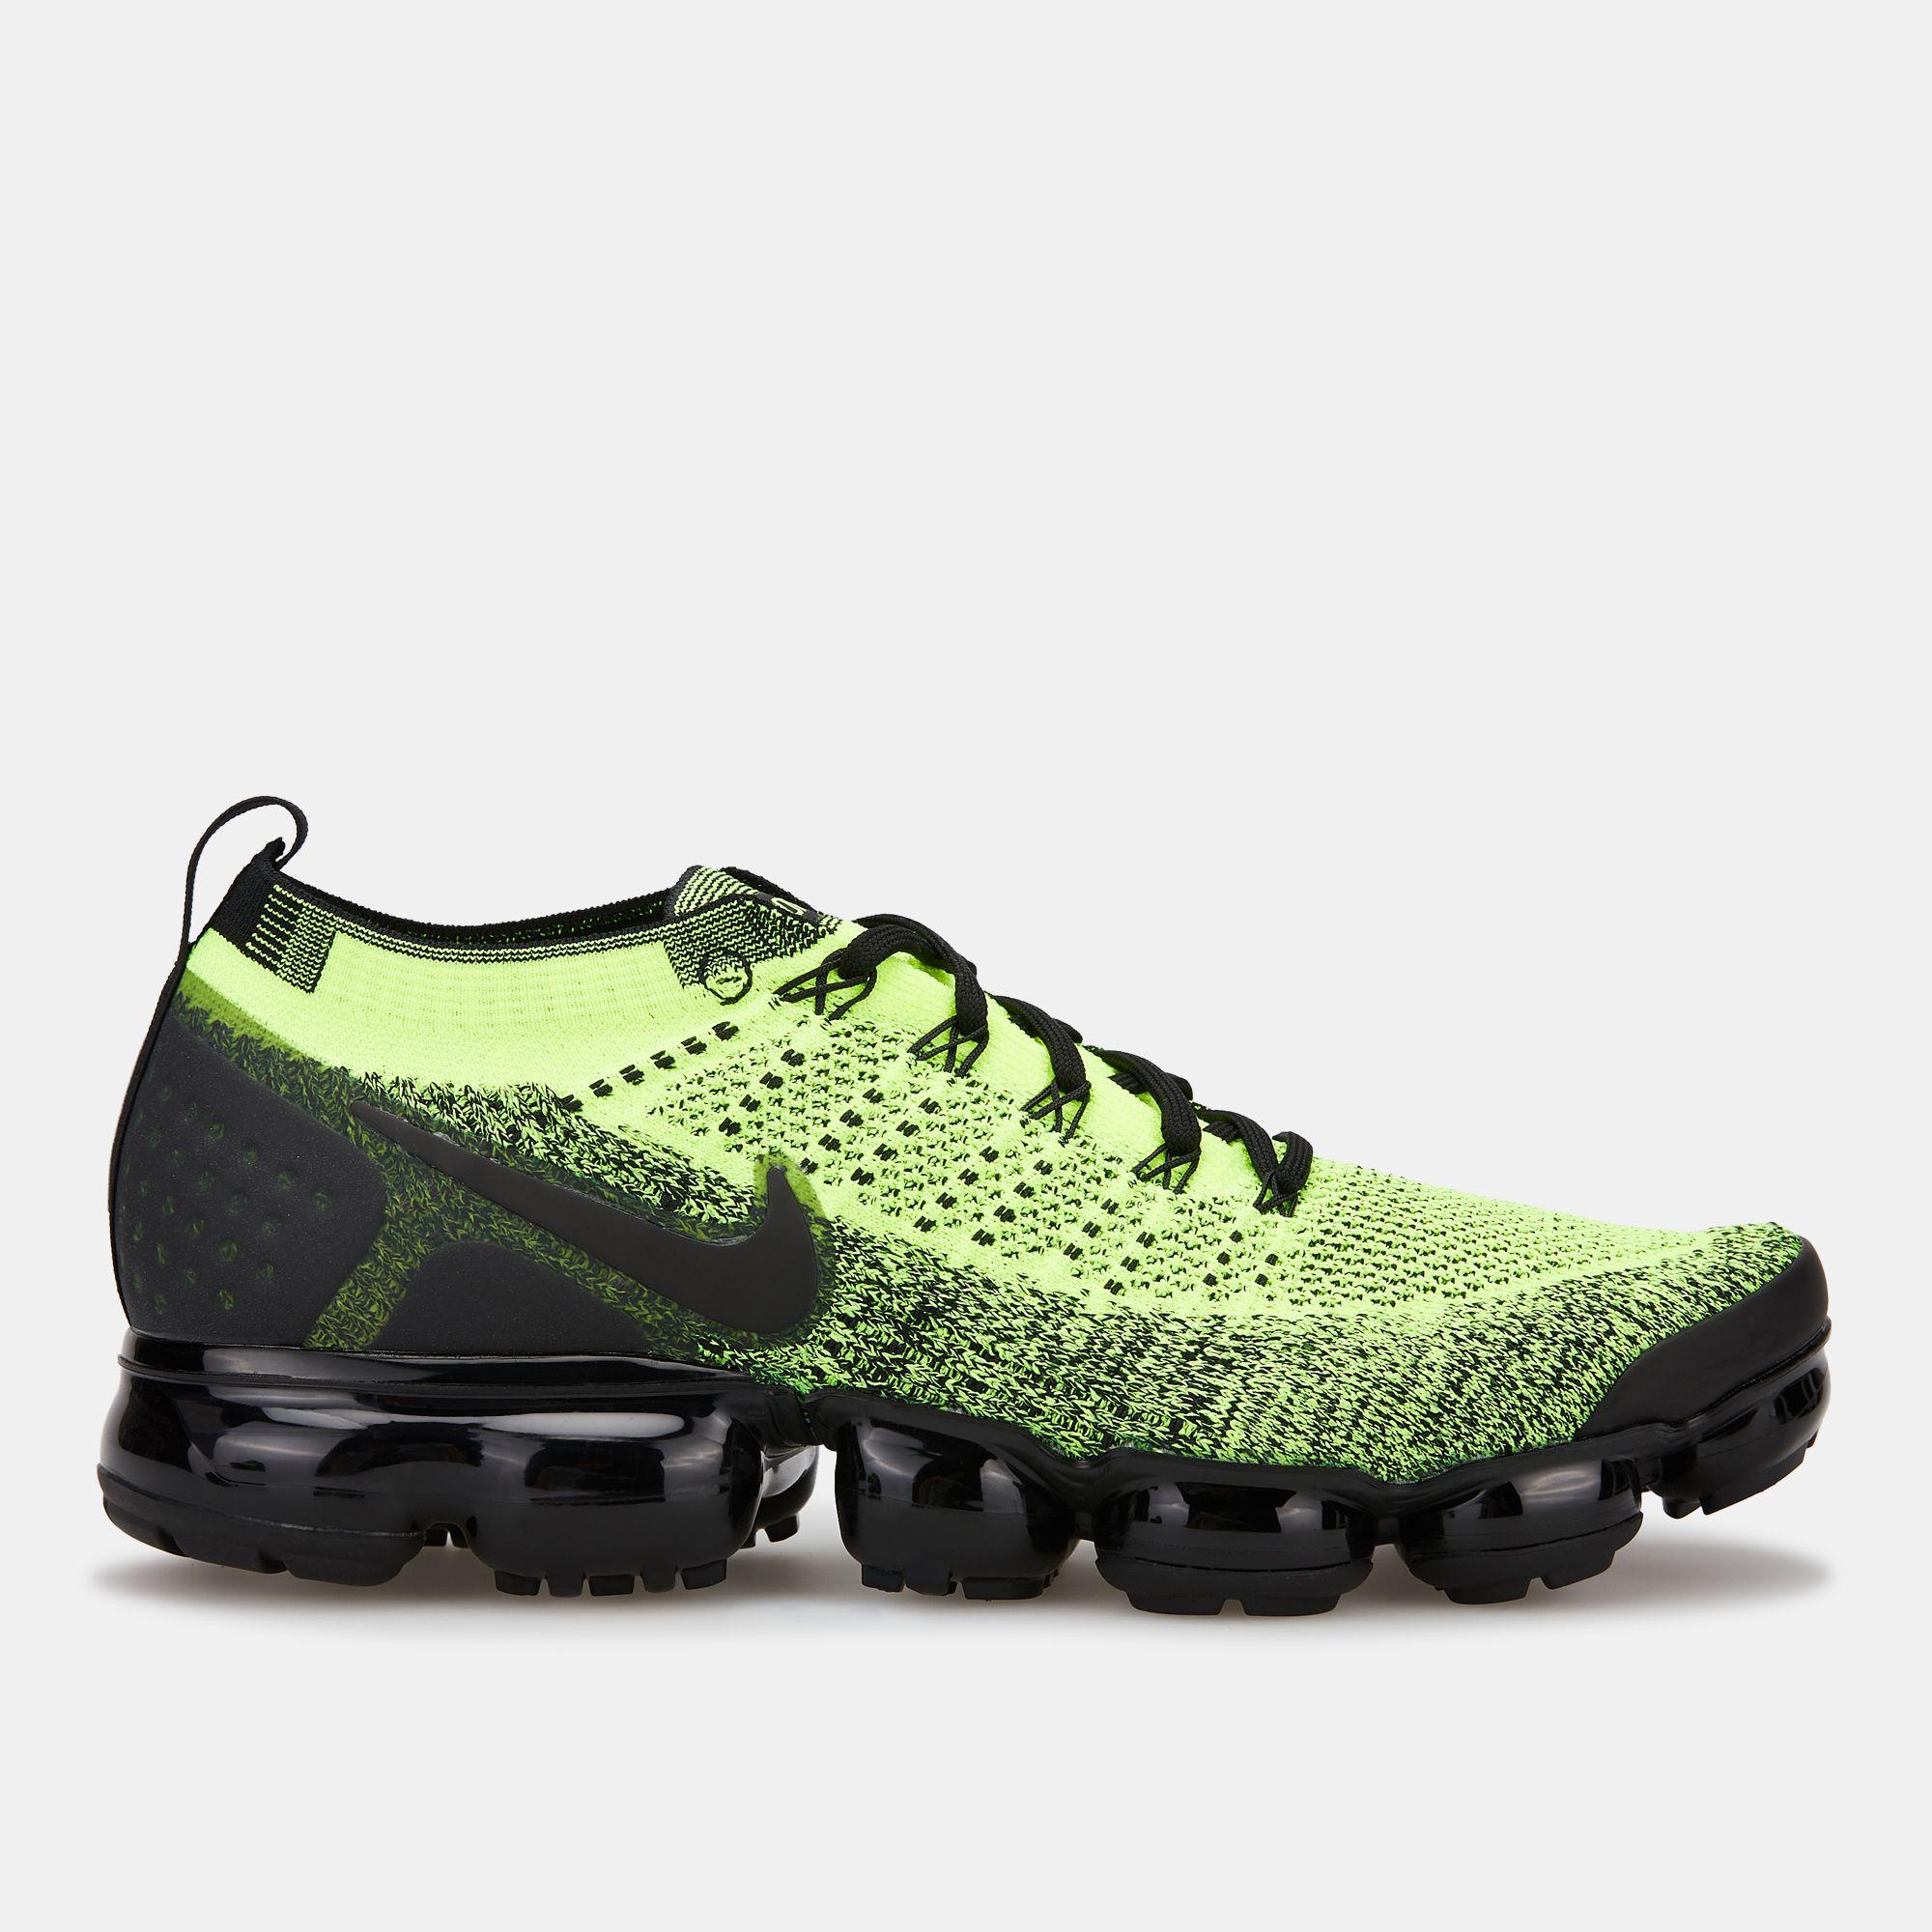 outlet store dee70 0826c Nike Air Men's VaporMax Flyknit 2 Shoe